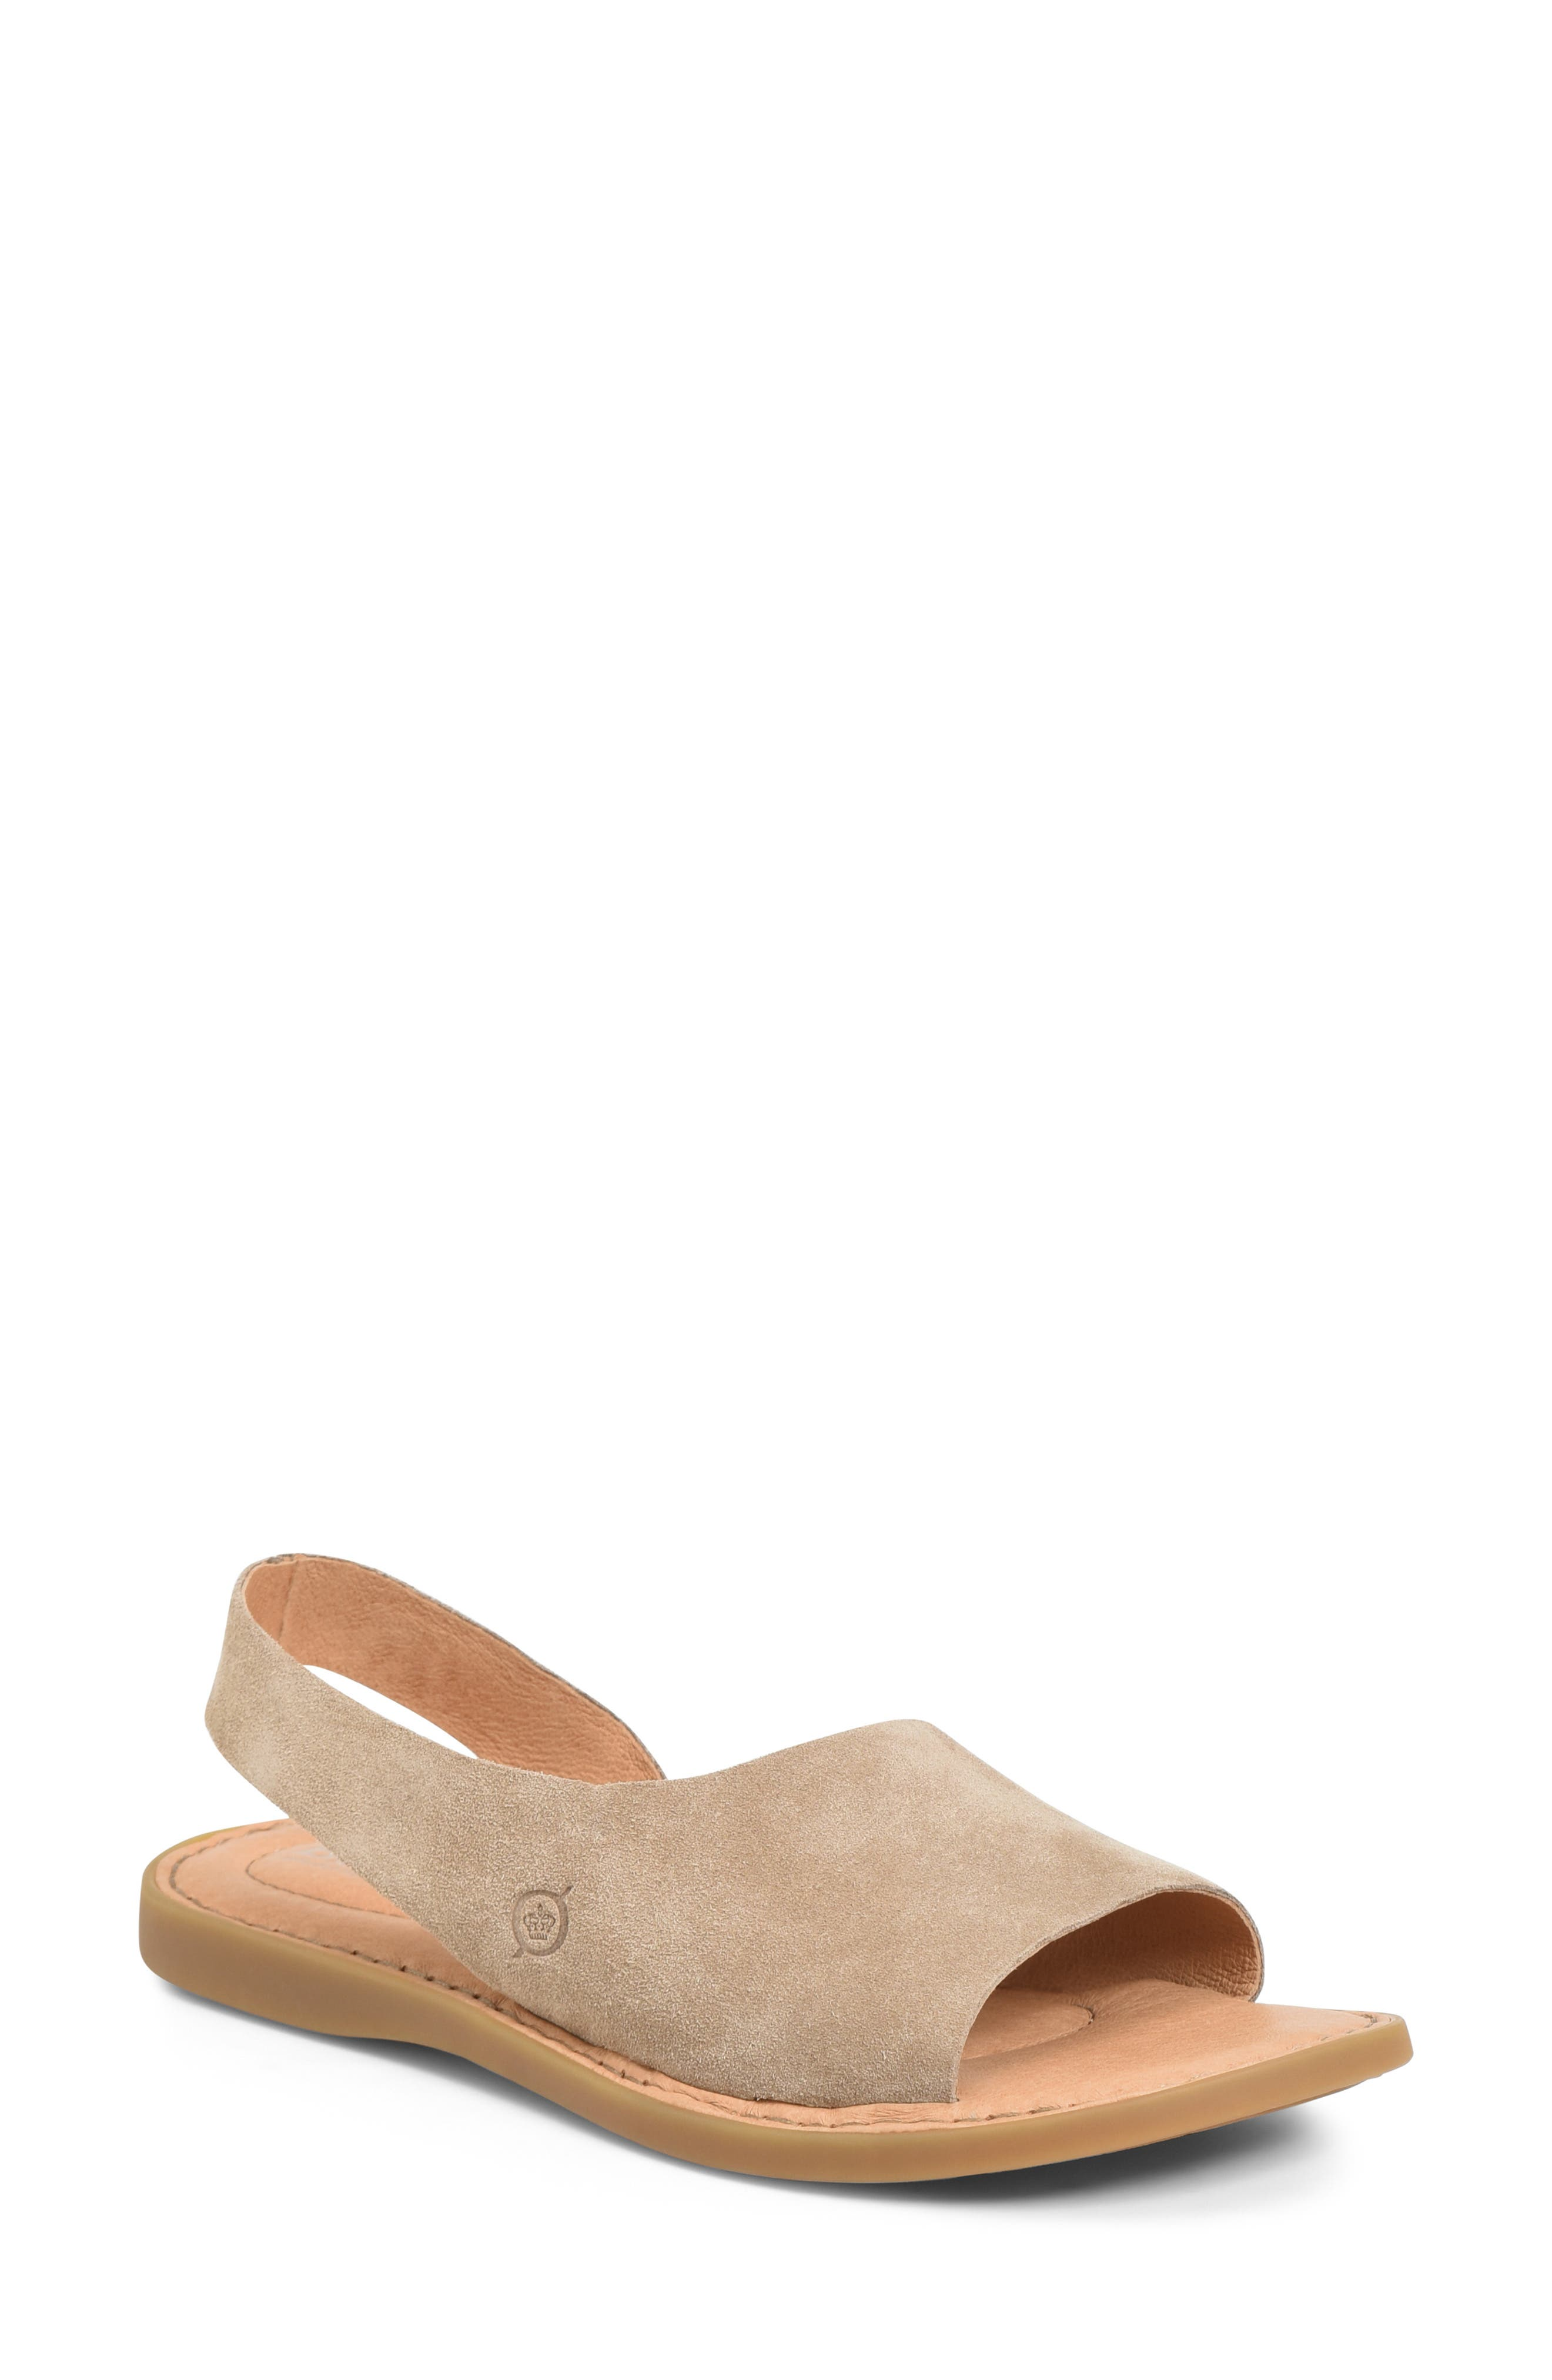 Women's B?rn Inlet Sandal